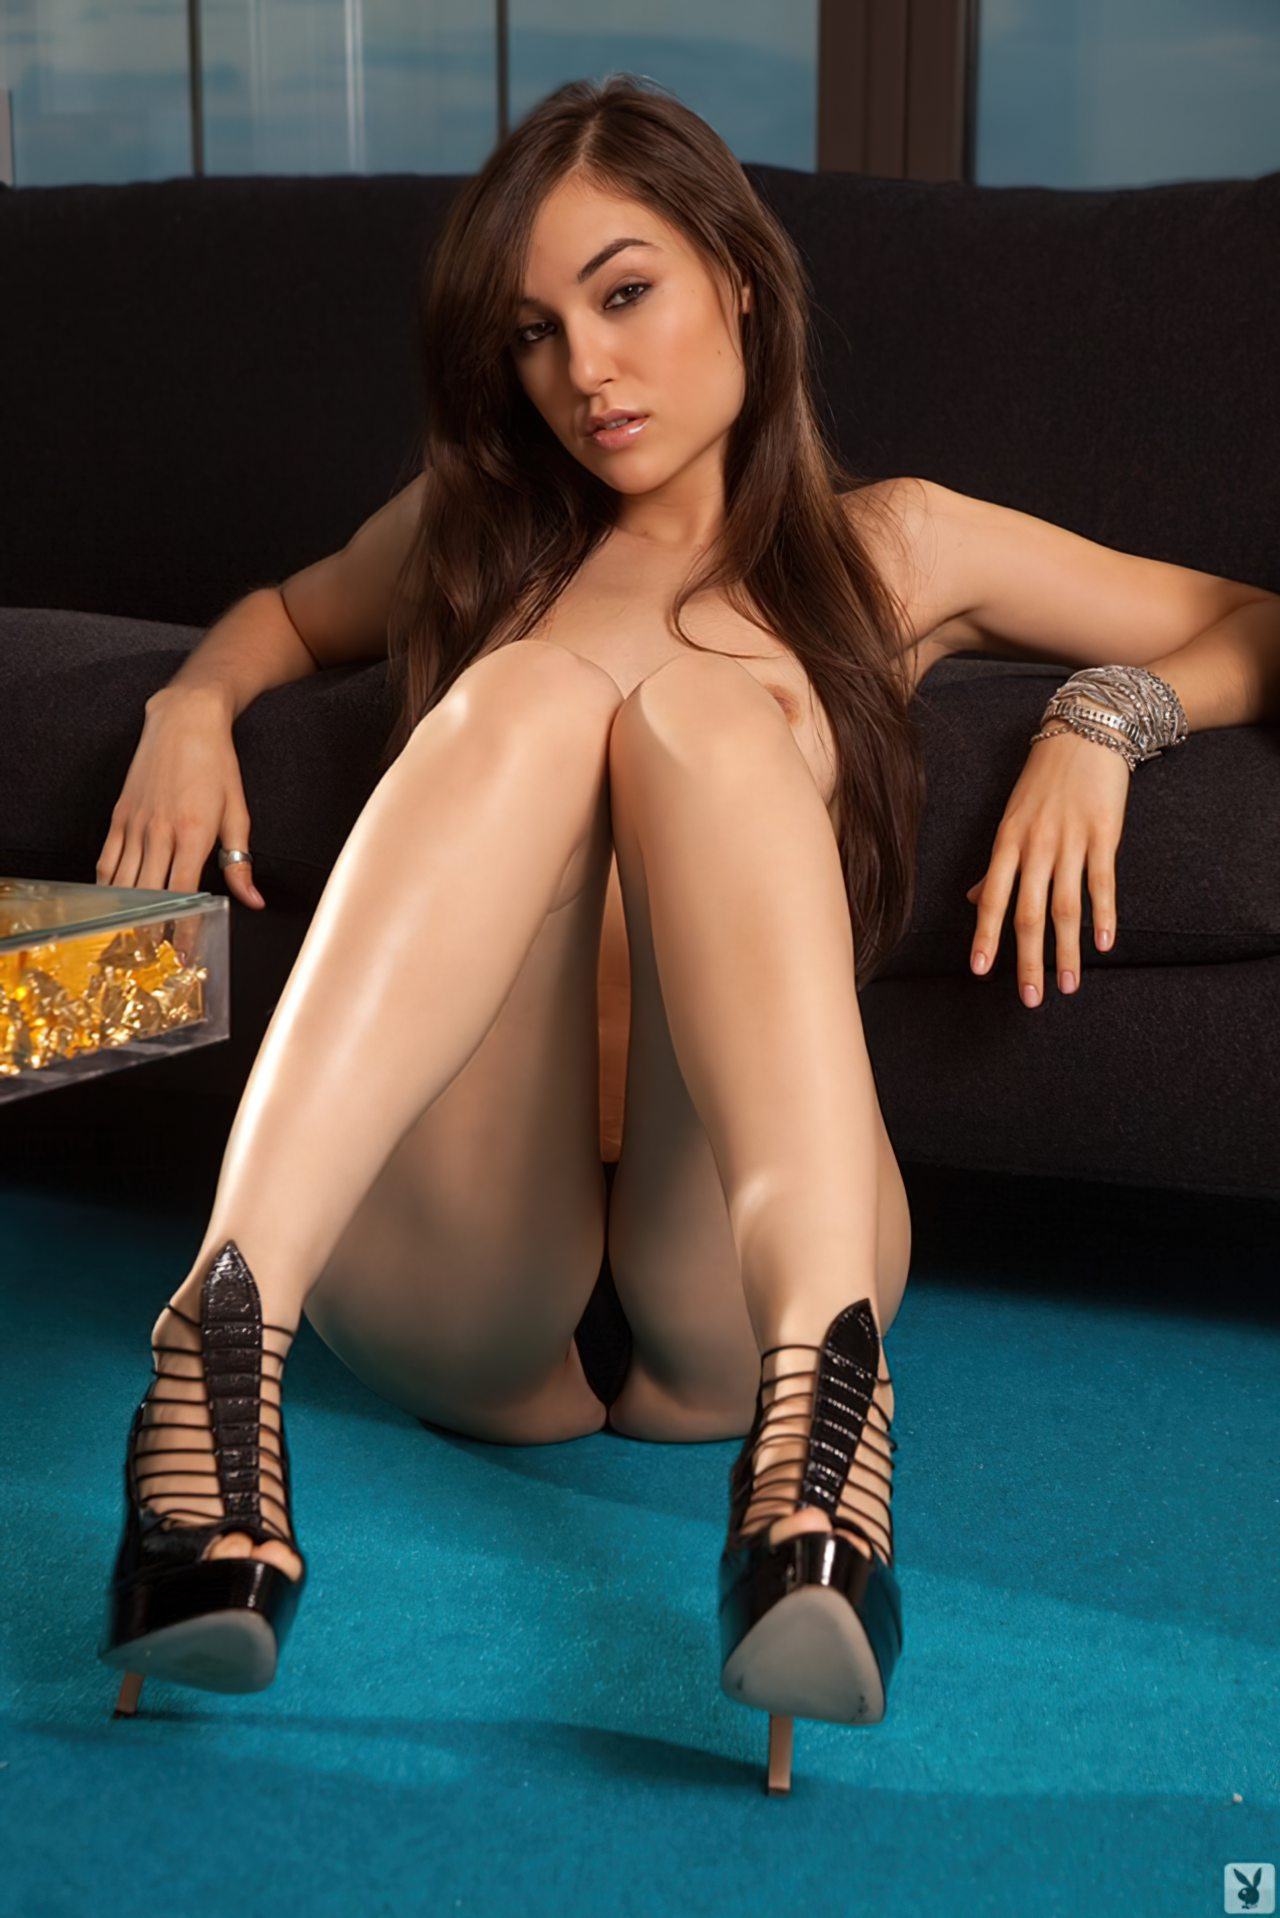 Sasha Grey na Playboy (36)